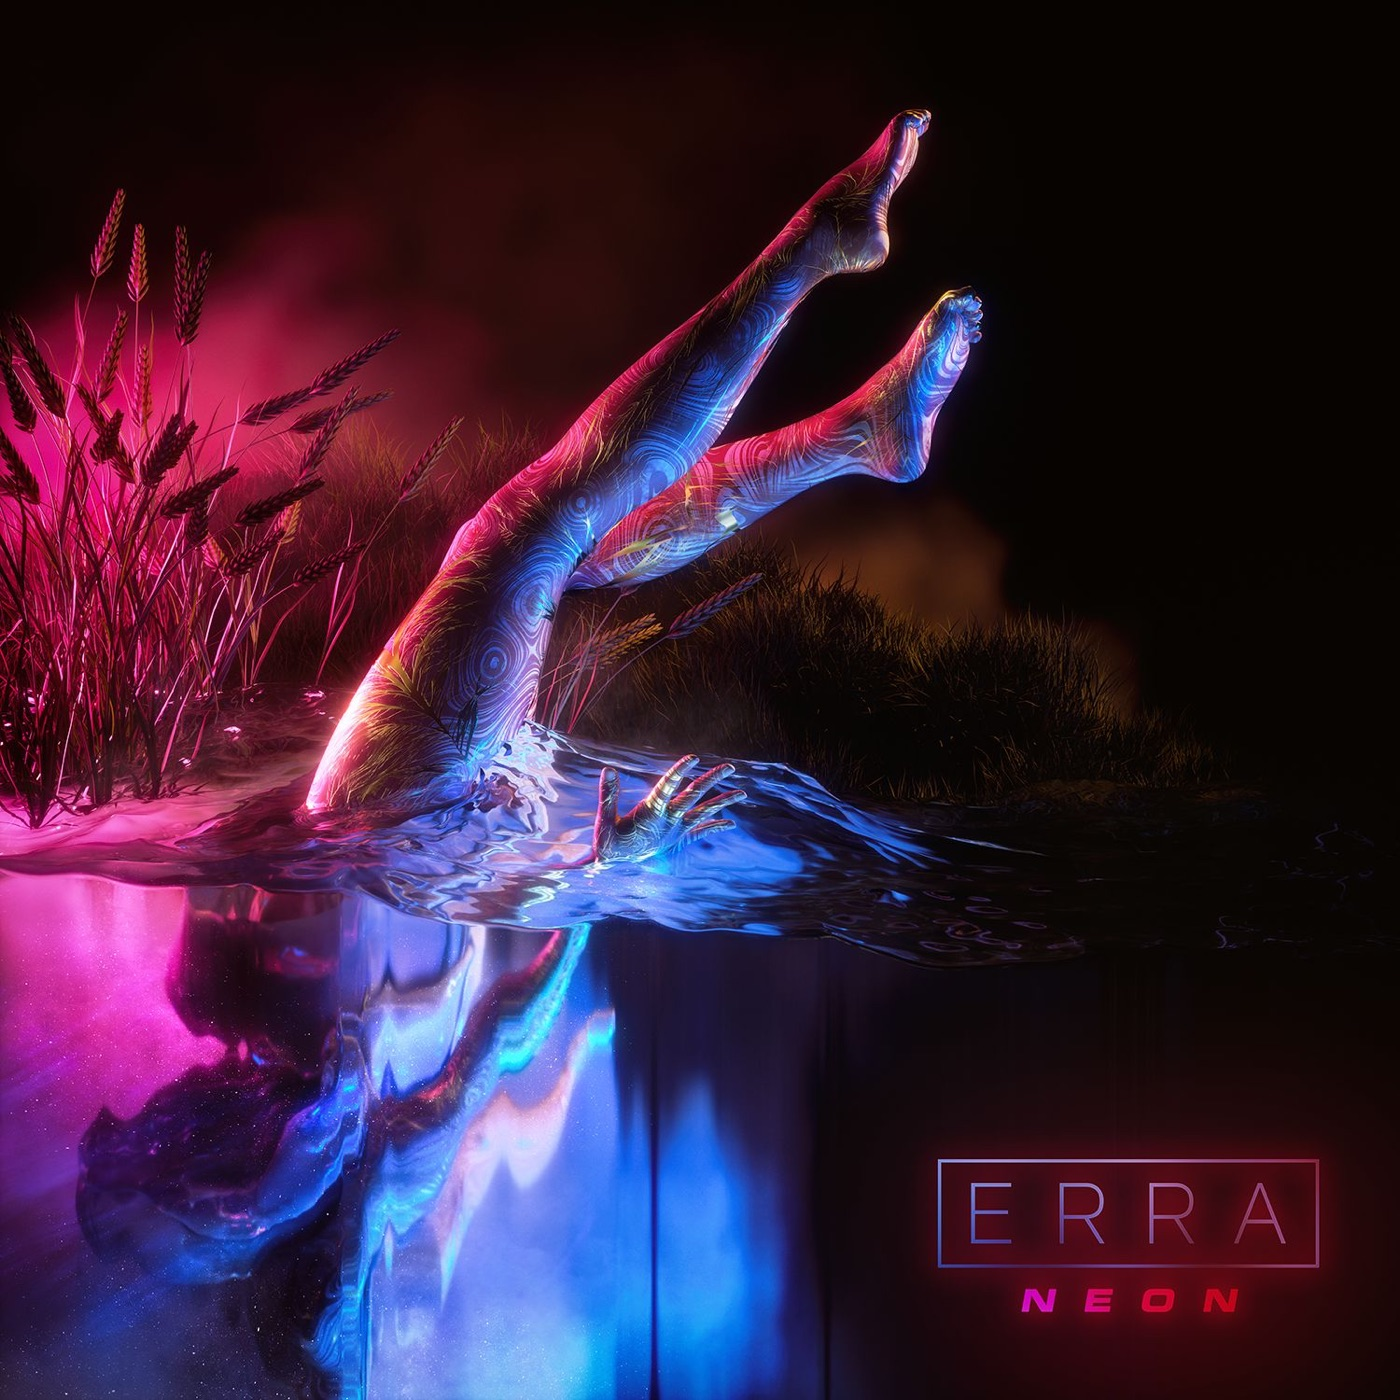 Erra - Disarray [single] (2018)